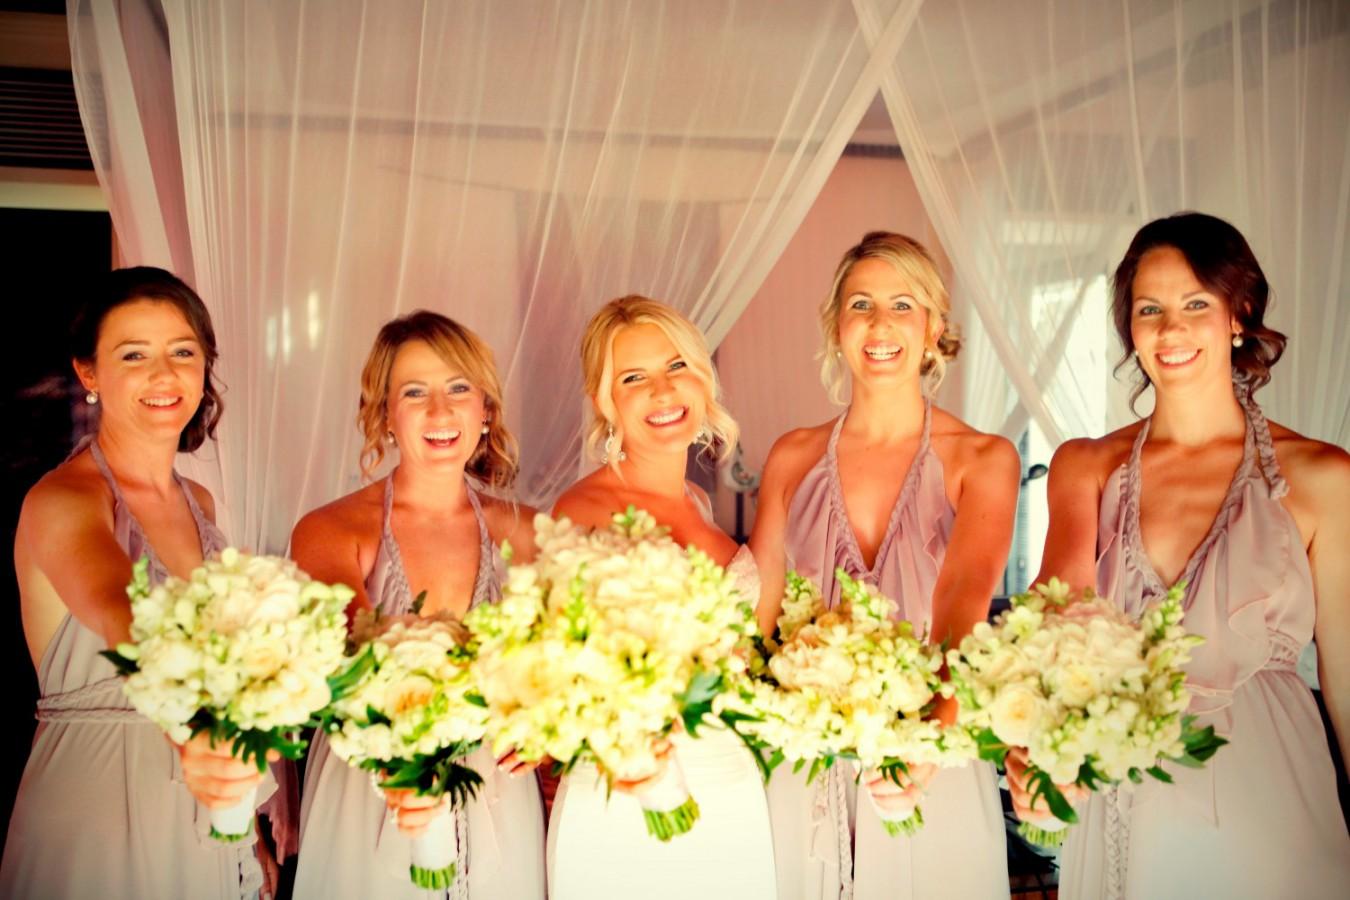 2011.10.16, Megann and Daniel, Ombak Luwung, MJY - Bali Wedding Paradise (9)